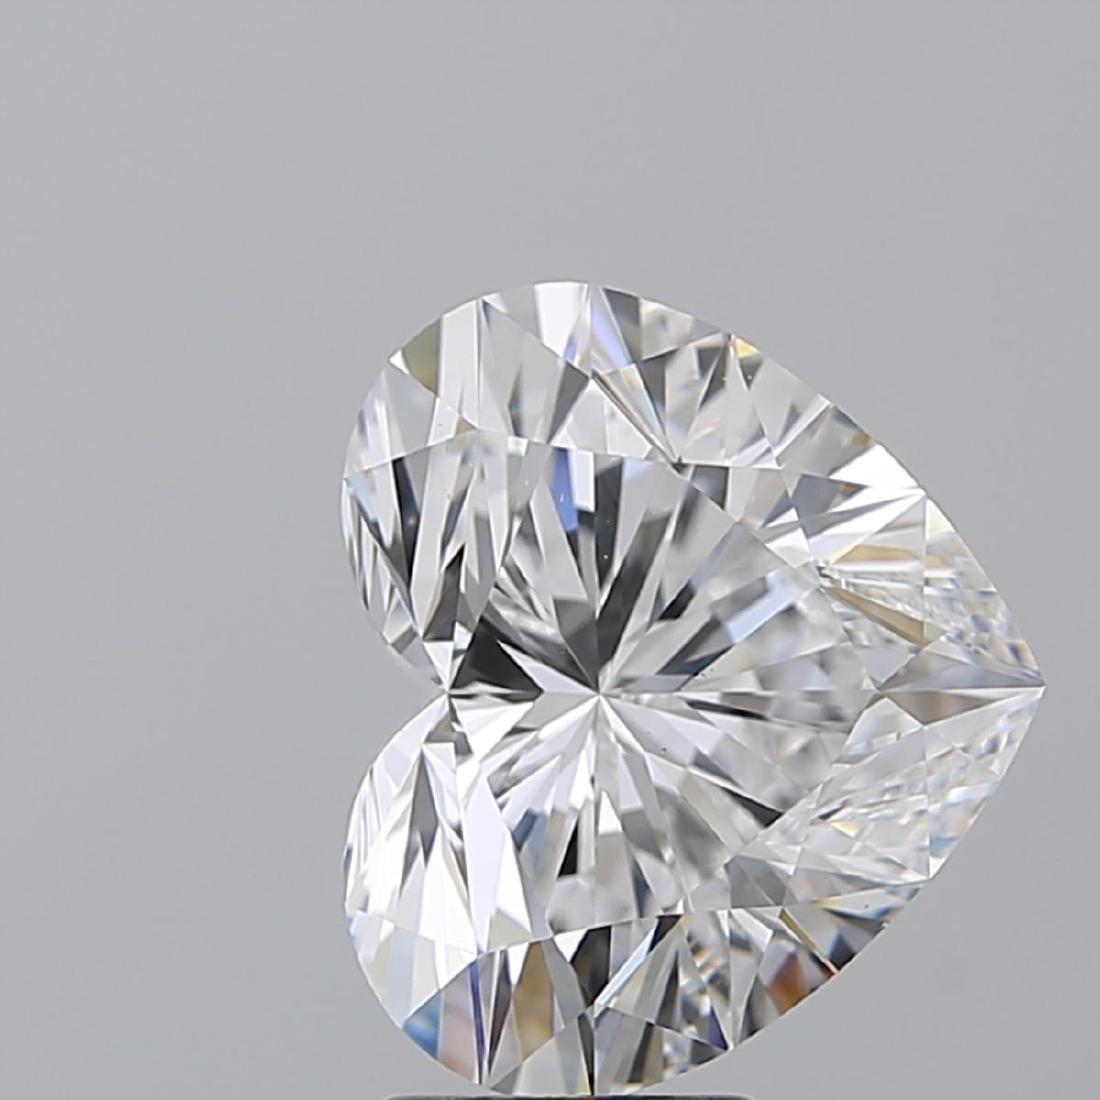 5.07 ct, Color D/VS2, Heart cut Diamond - 2